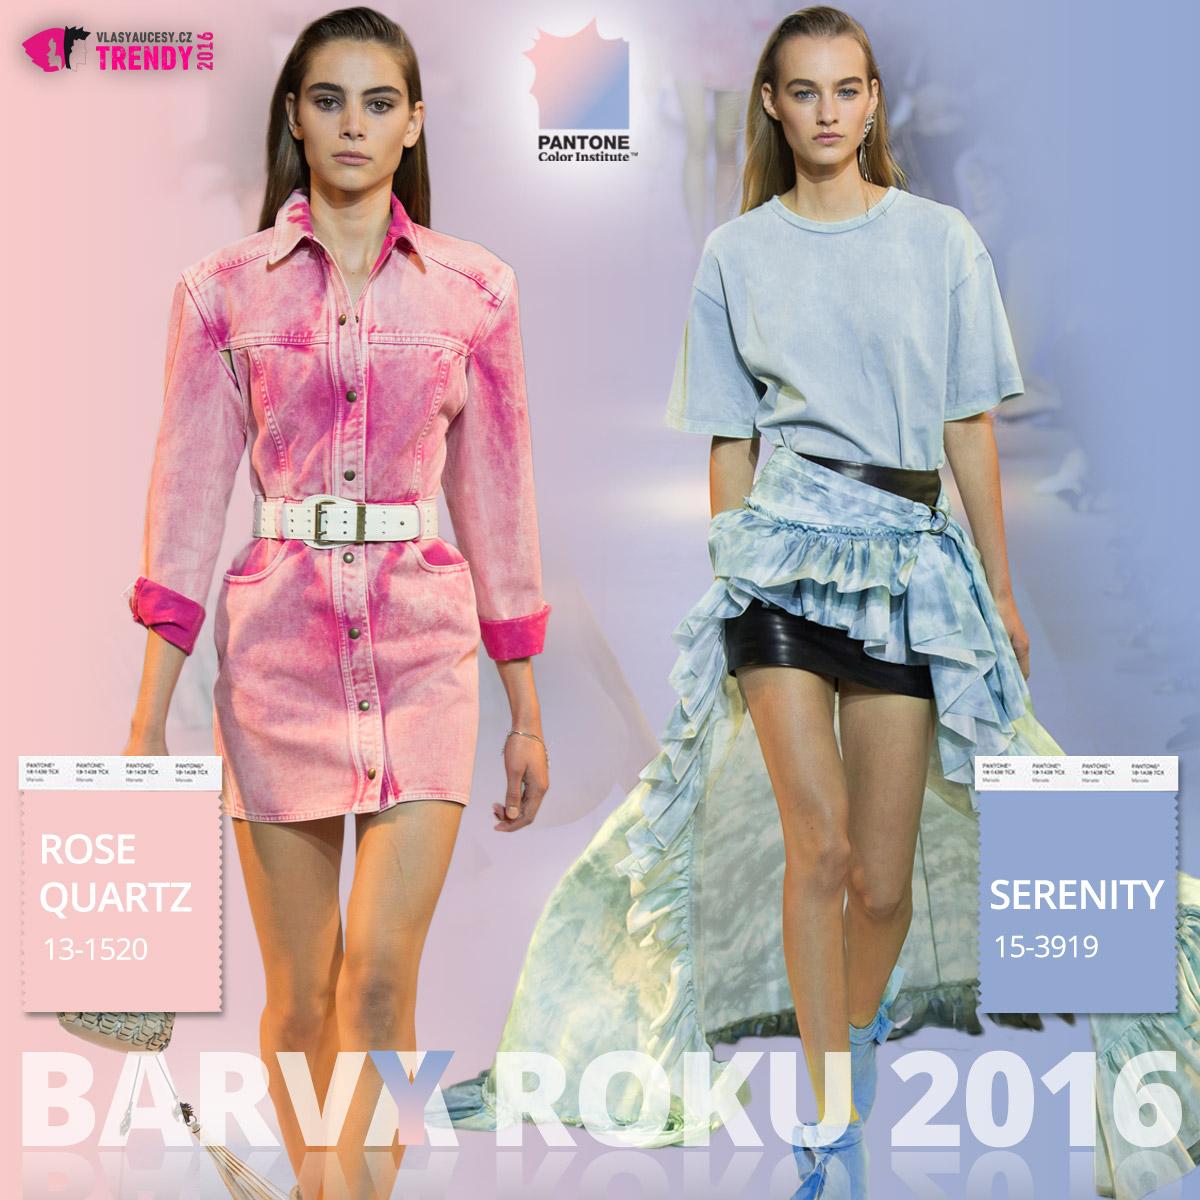 Barvy roku 2016 a móda Roberto Cavalli – kolekce jaro/léto 2016.